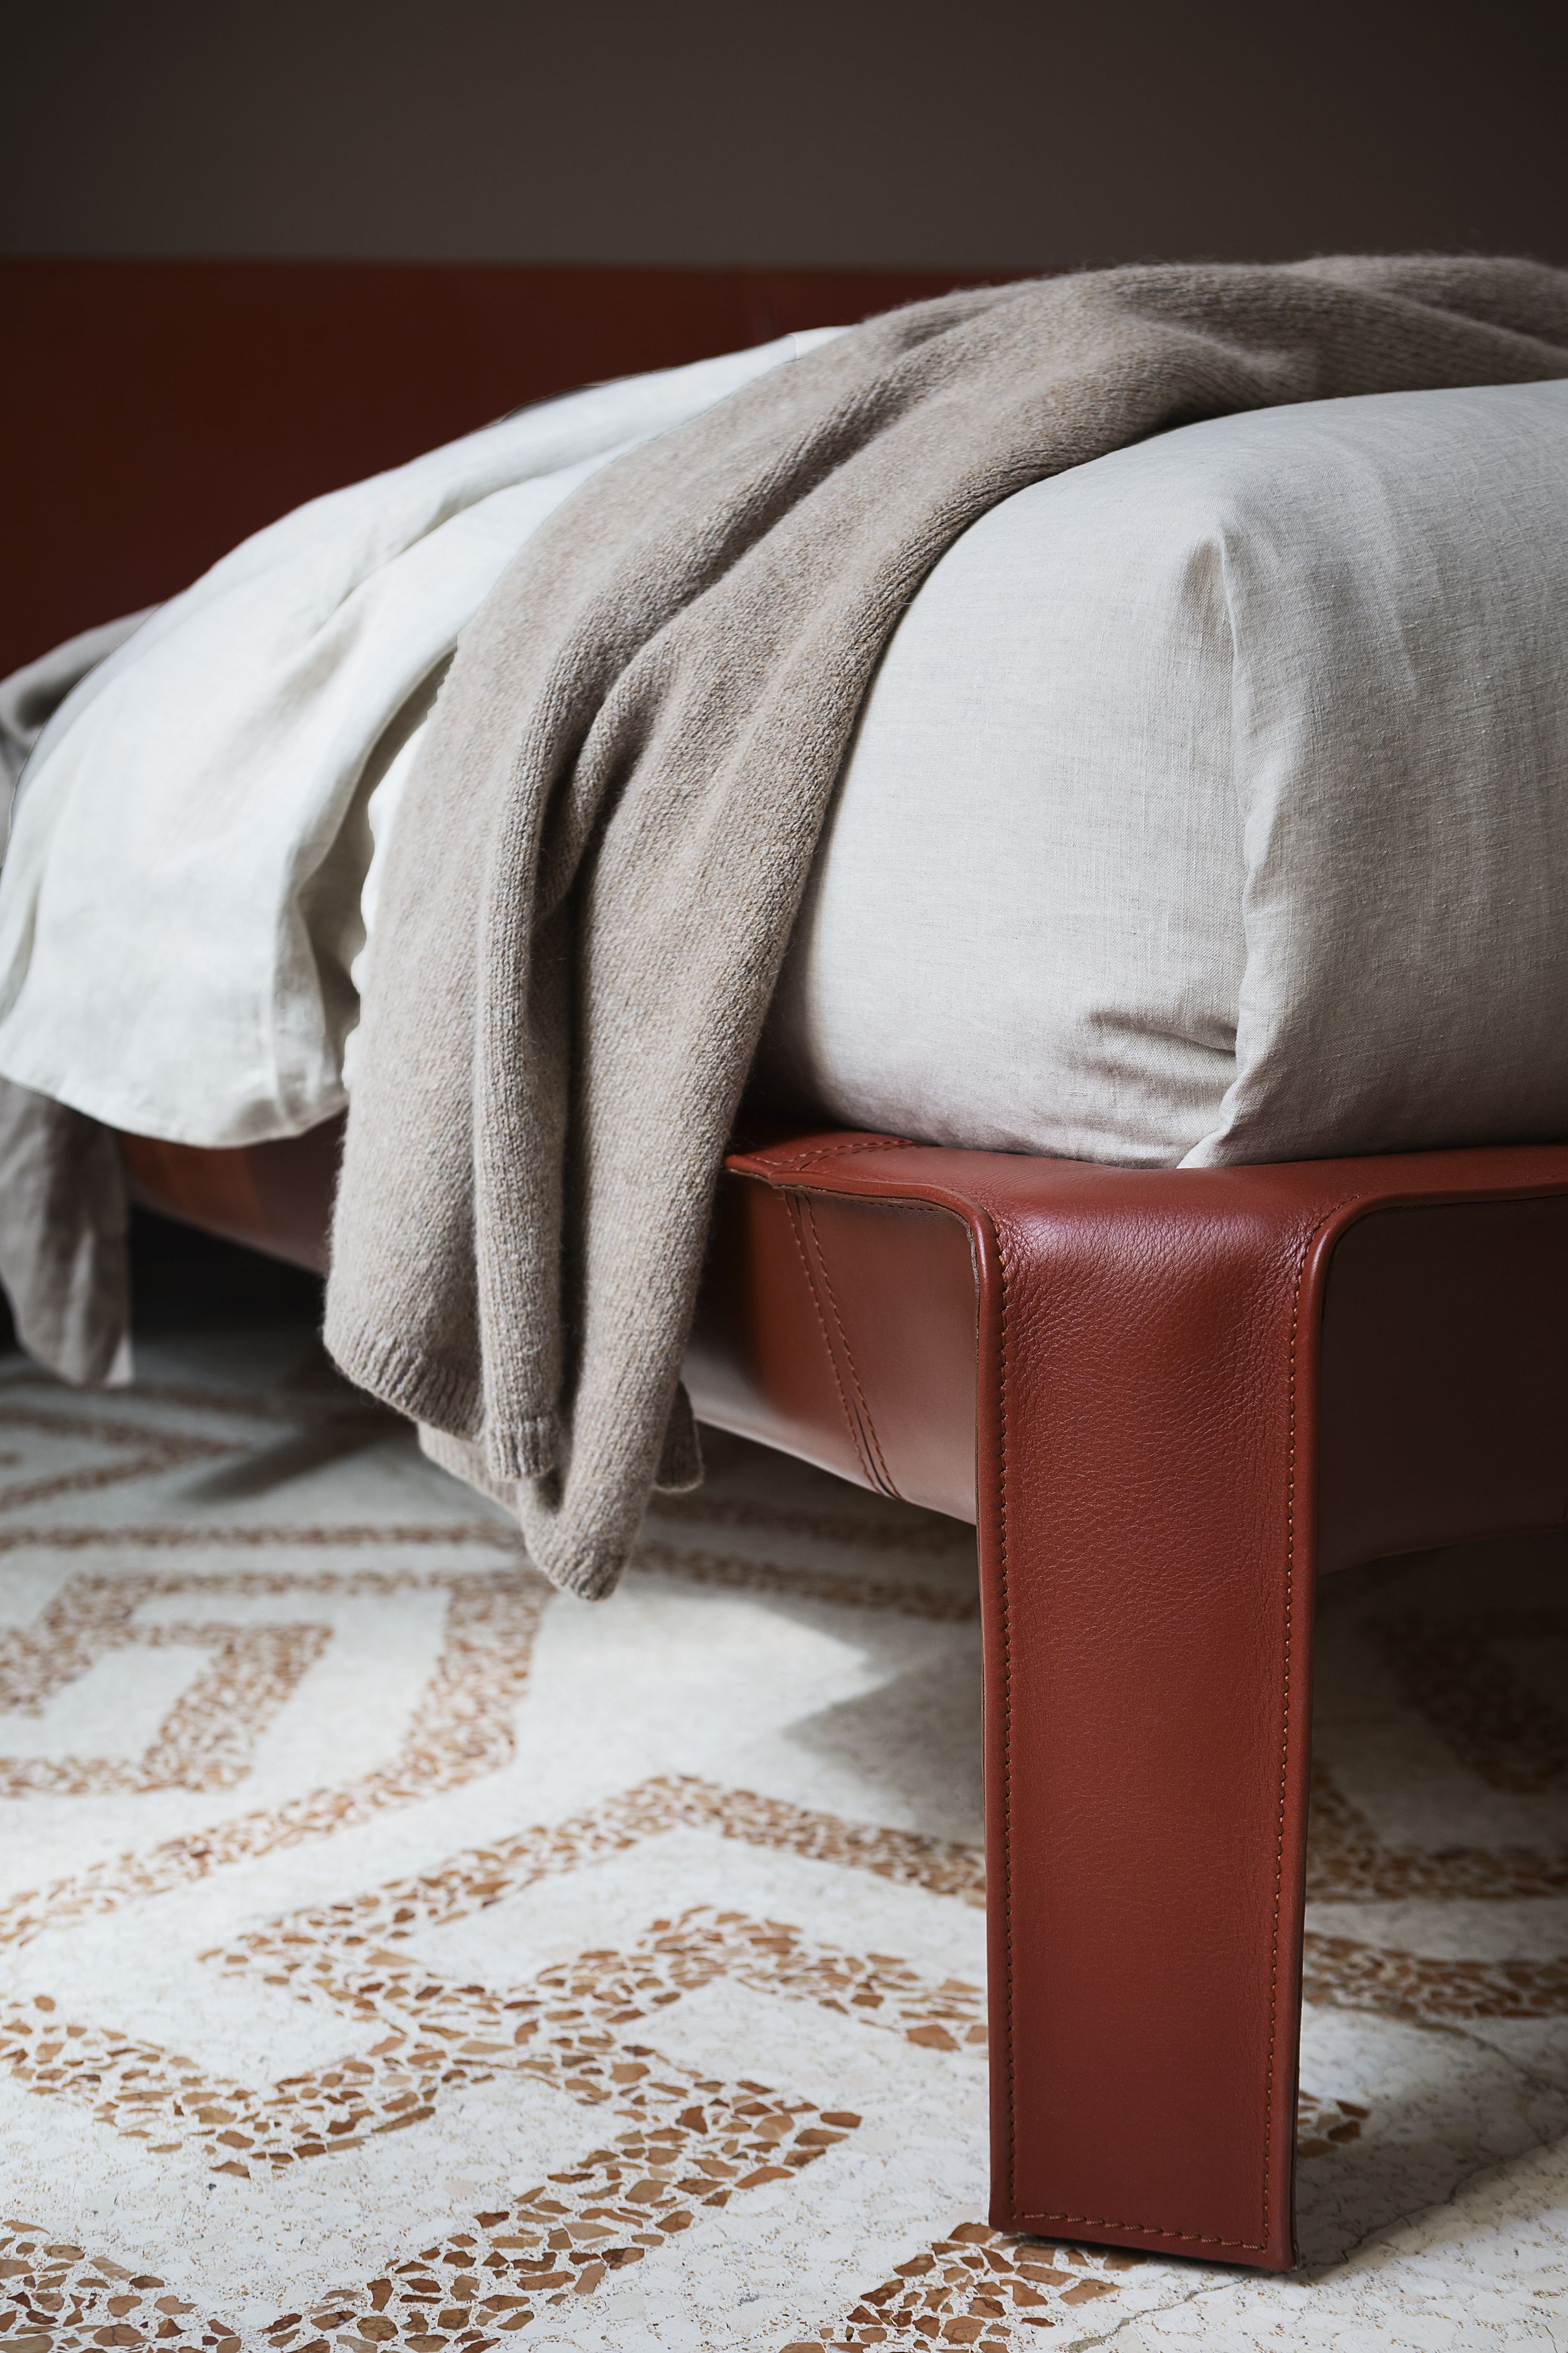 bed frames colour black and bulgarian on pinterest bedroomdelightful galerie bachmann modular system sofa george